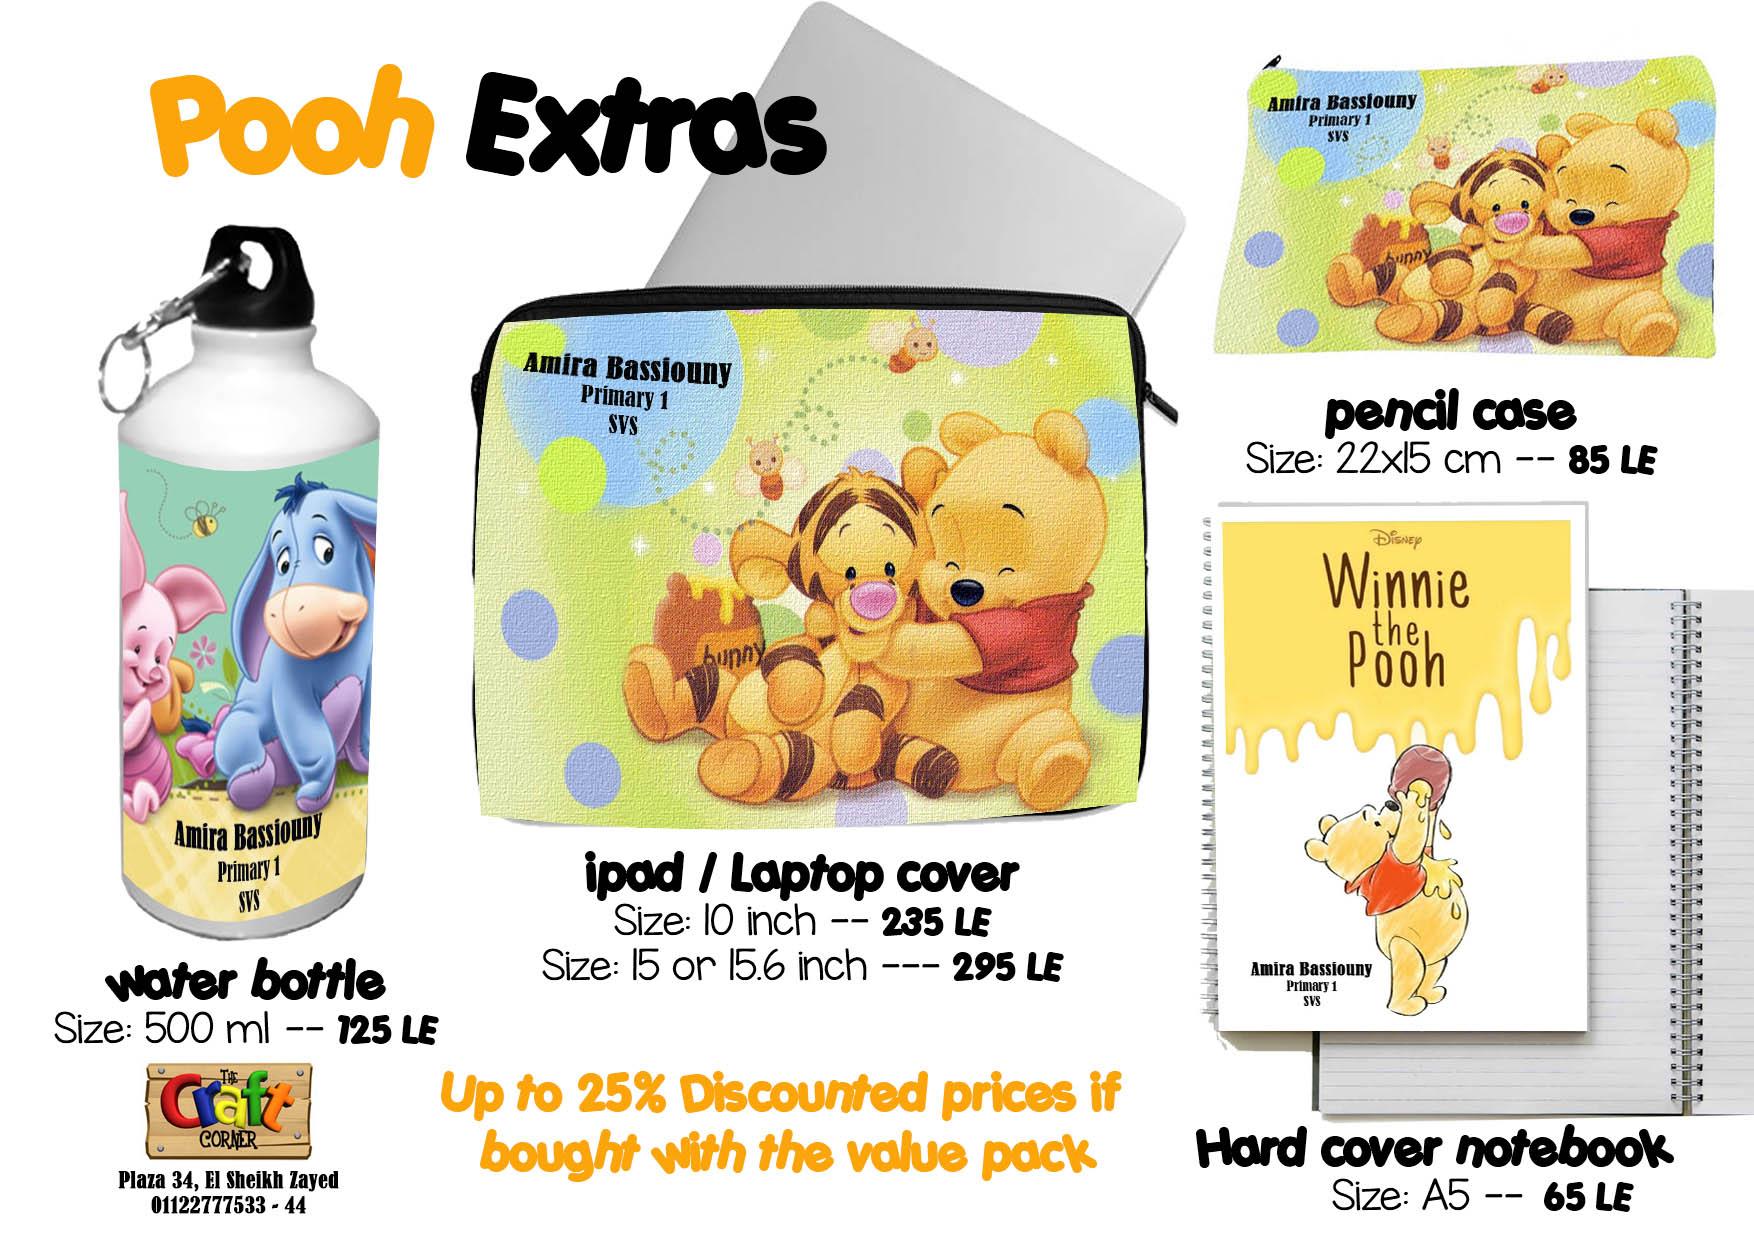 Pooh Extras